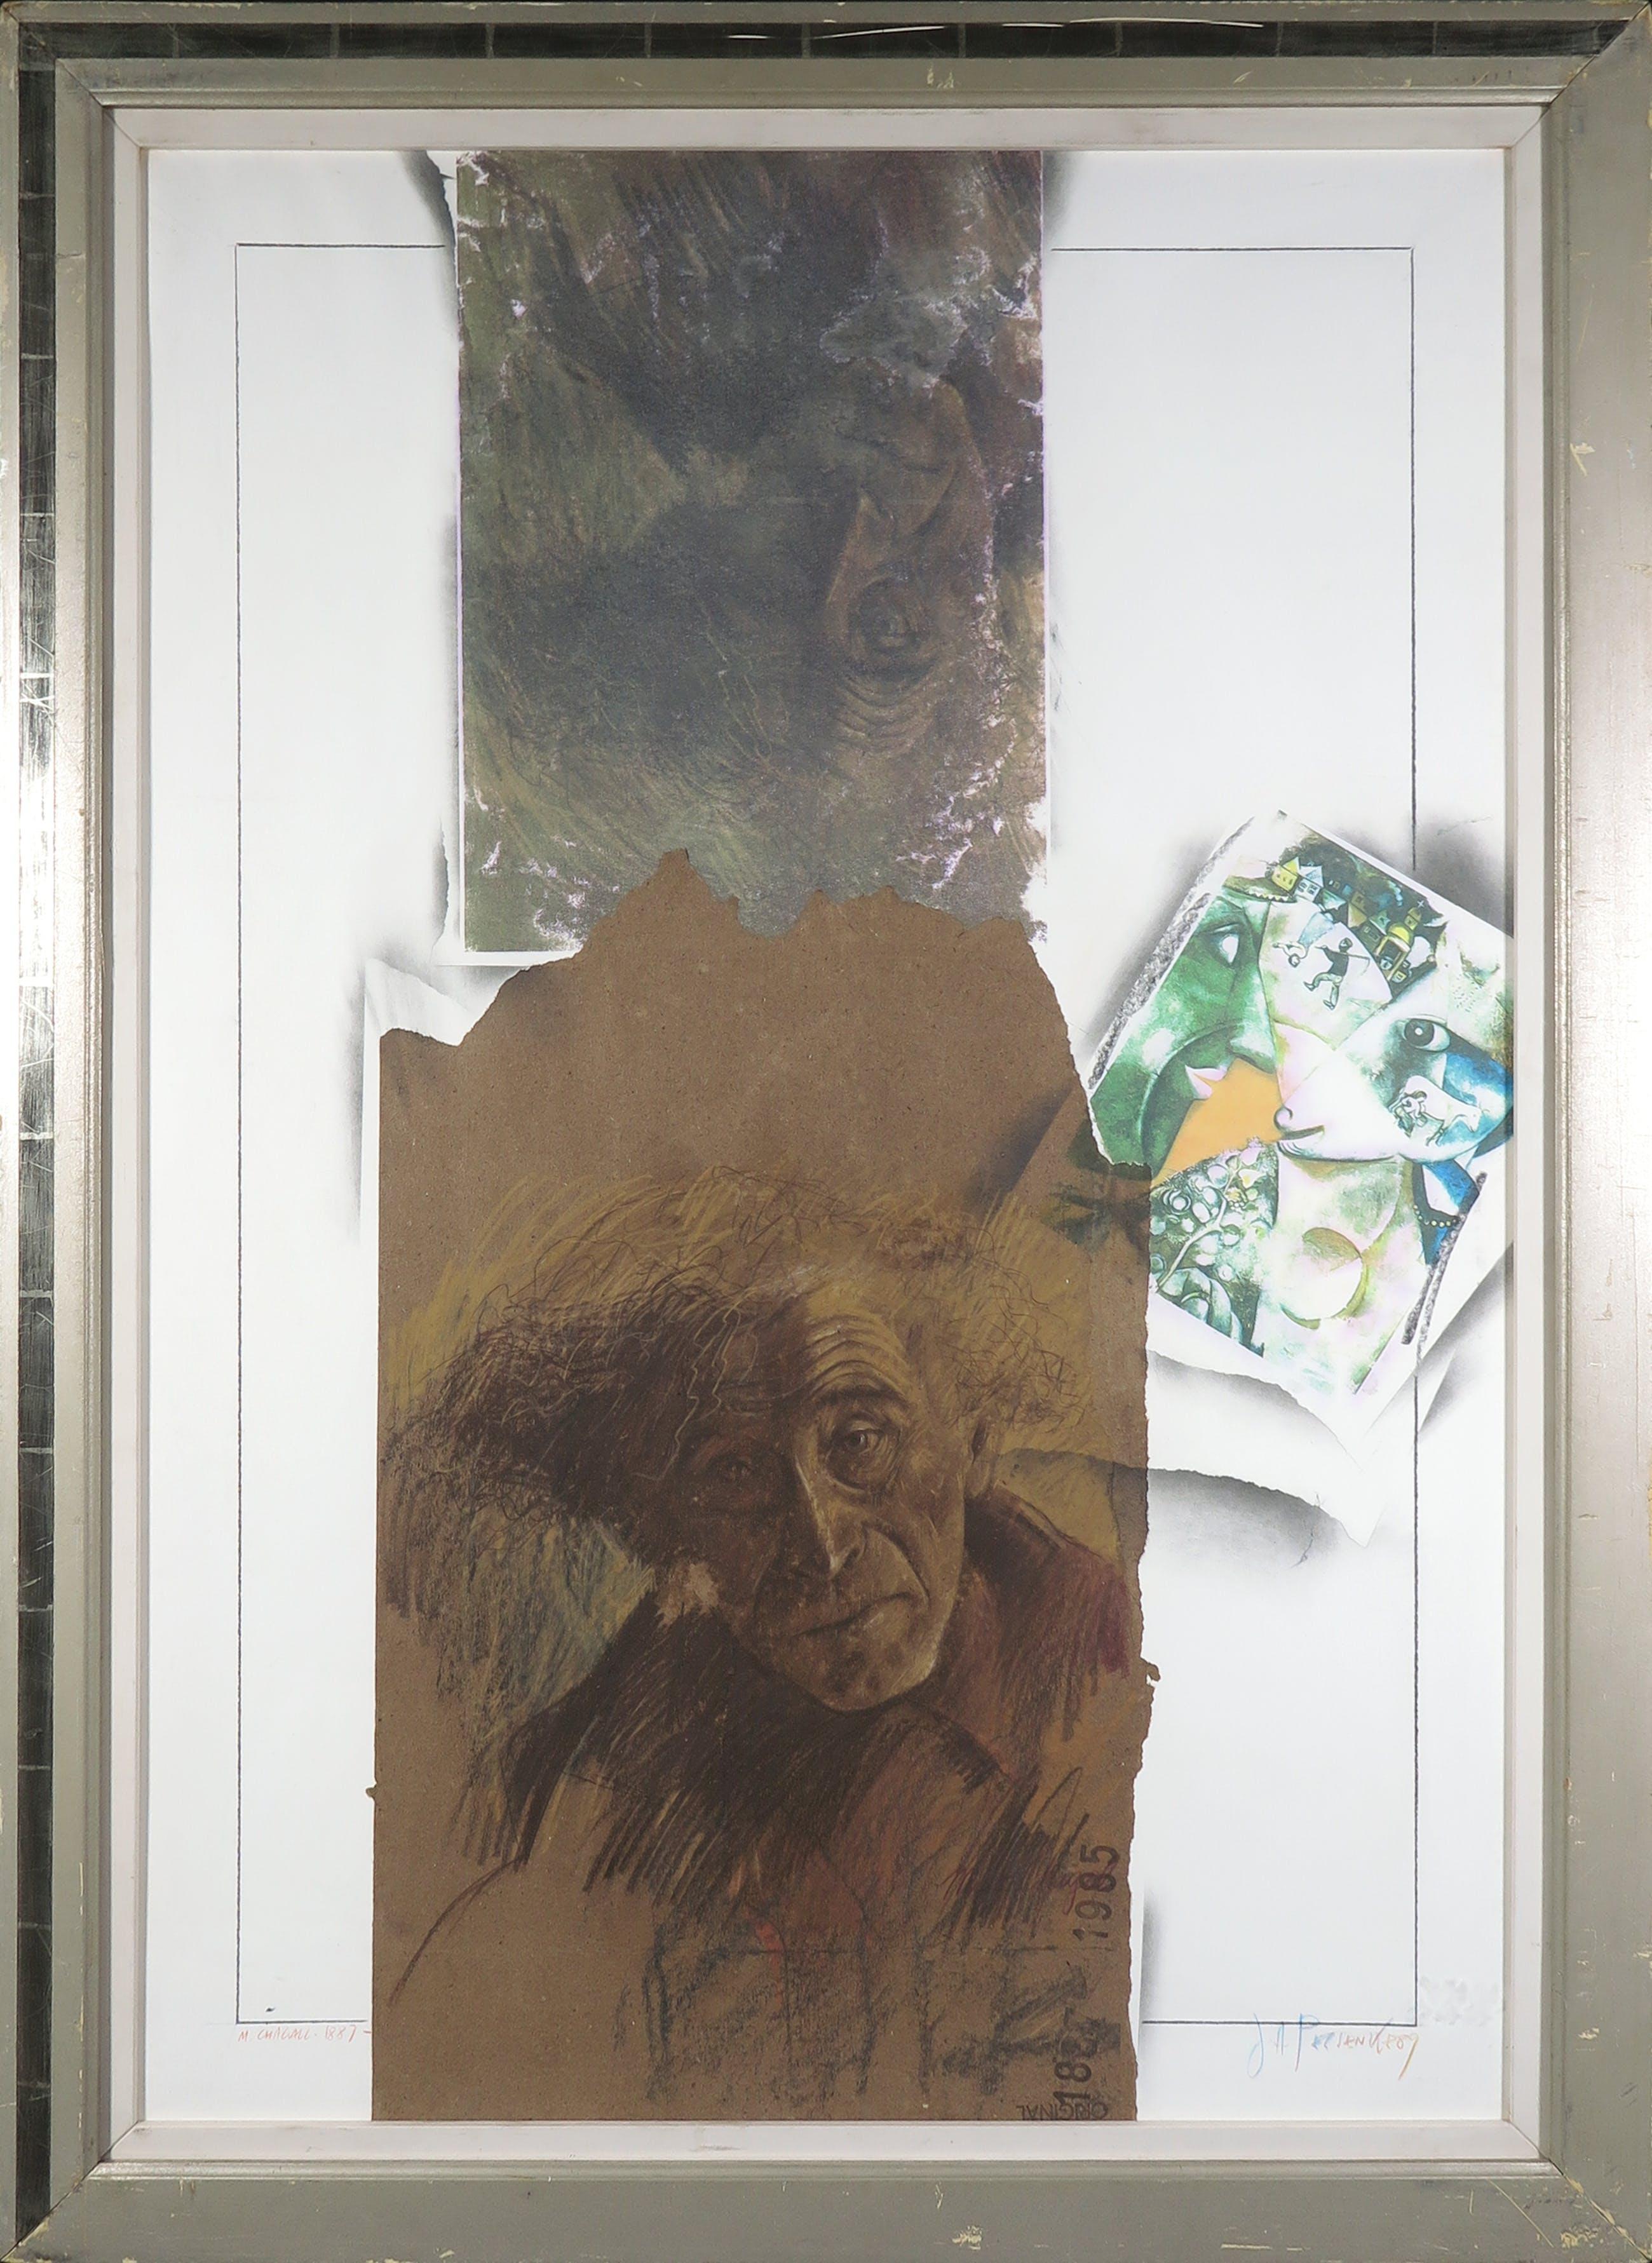 Joe A. Pecsenke - Potlood en collage, Marc Chagall 1887 - Ingelijst (Groot) kopen? Bied vanaf 150!